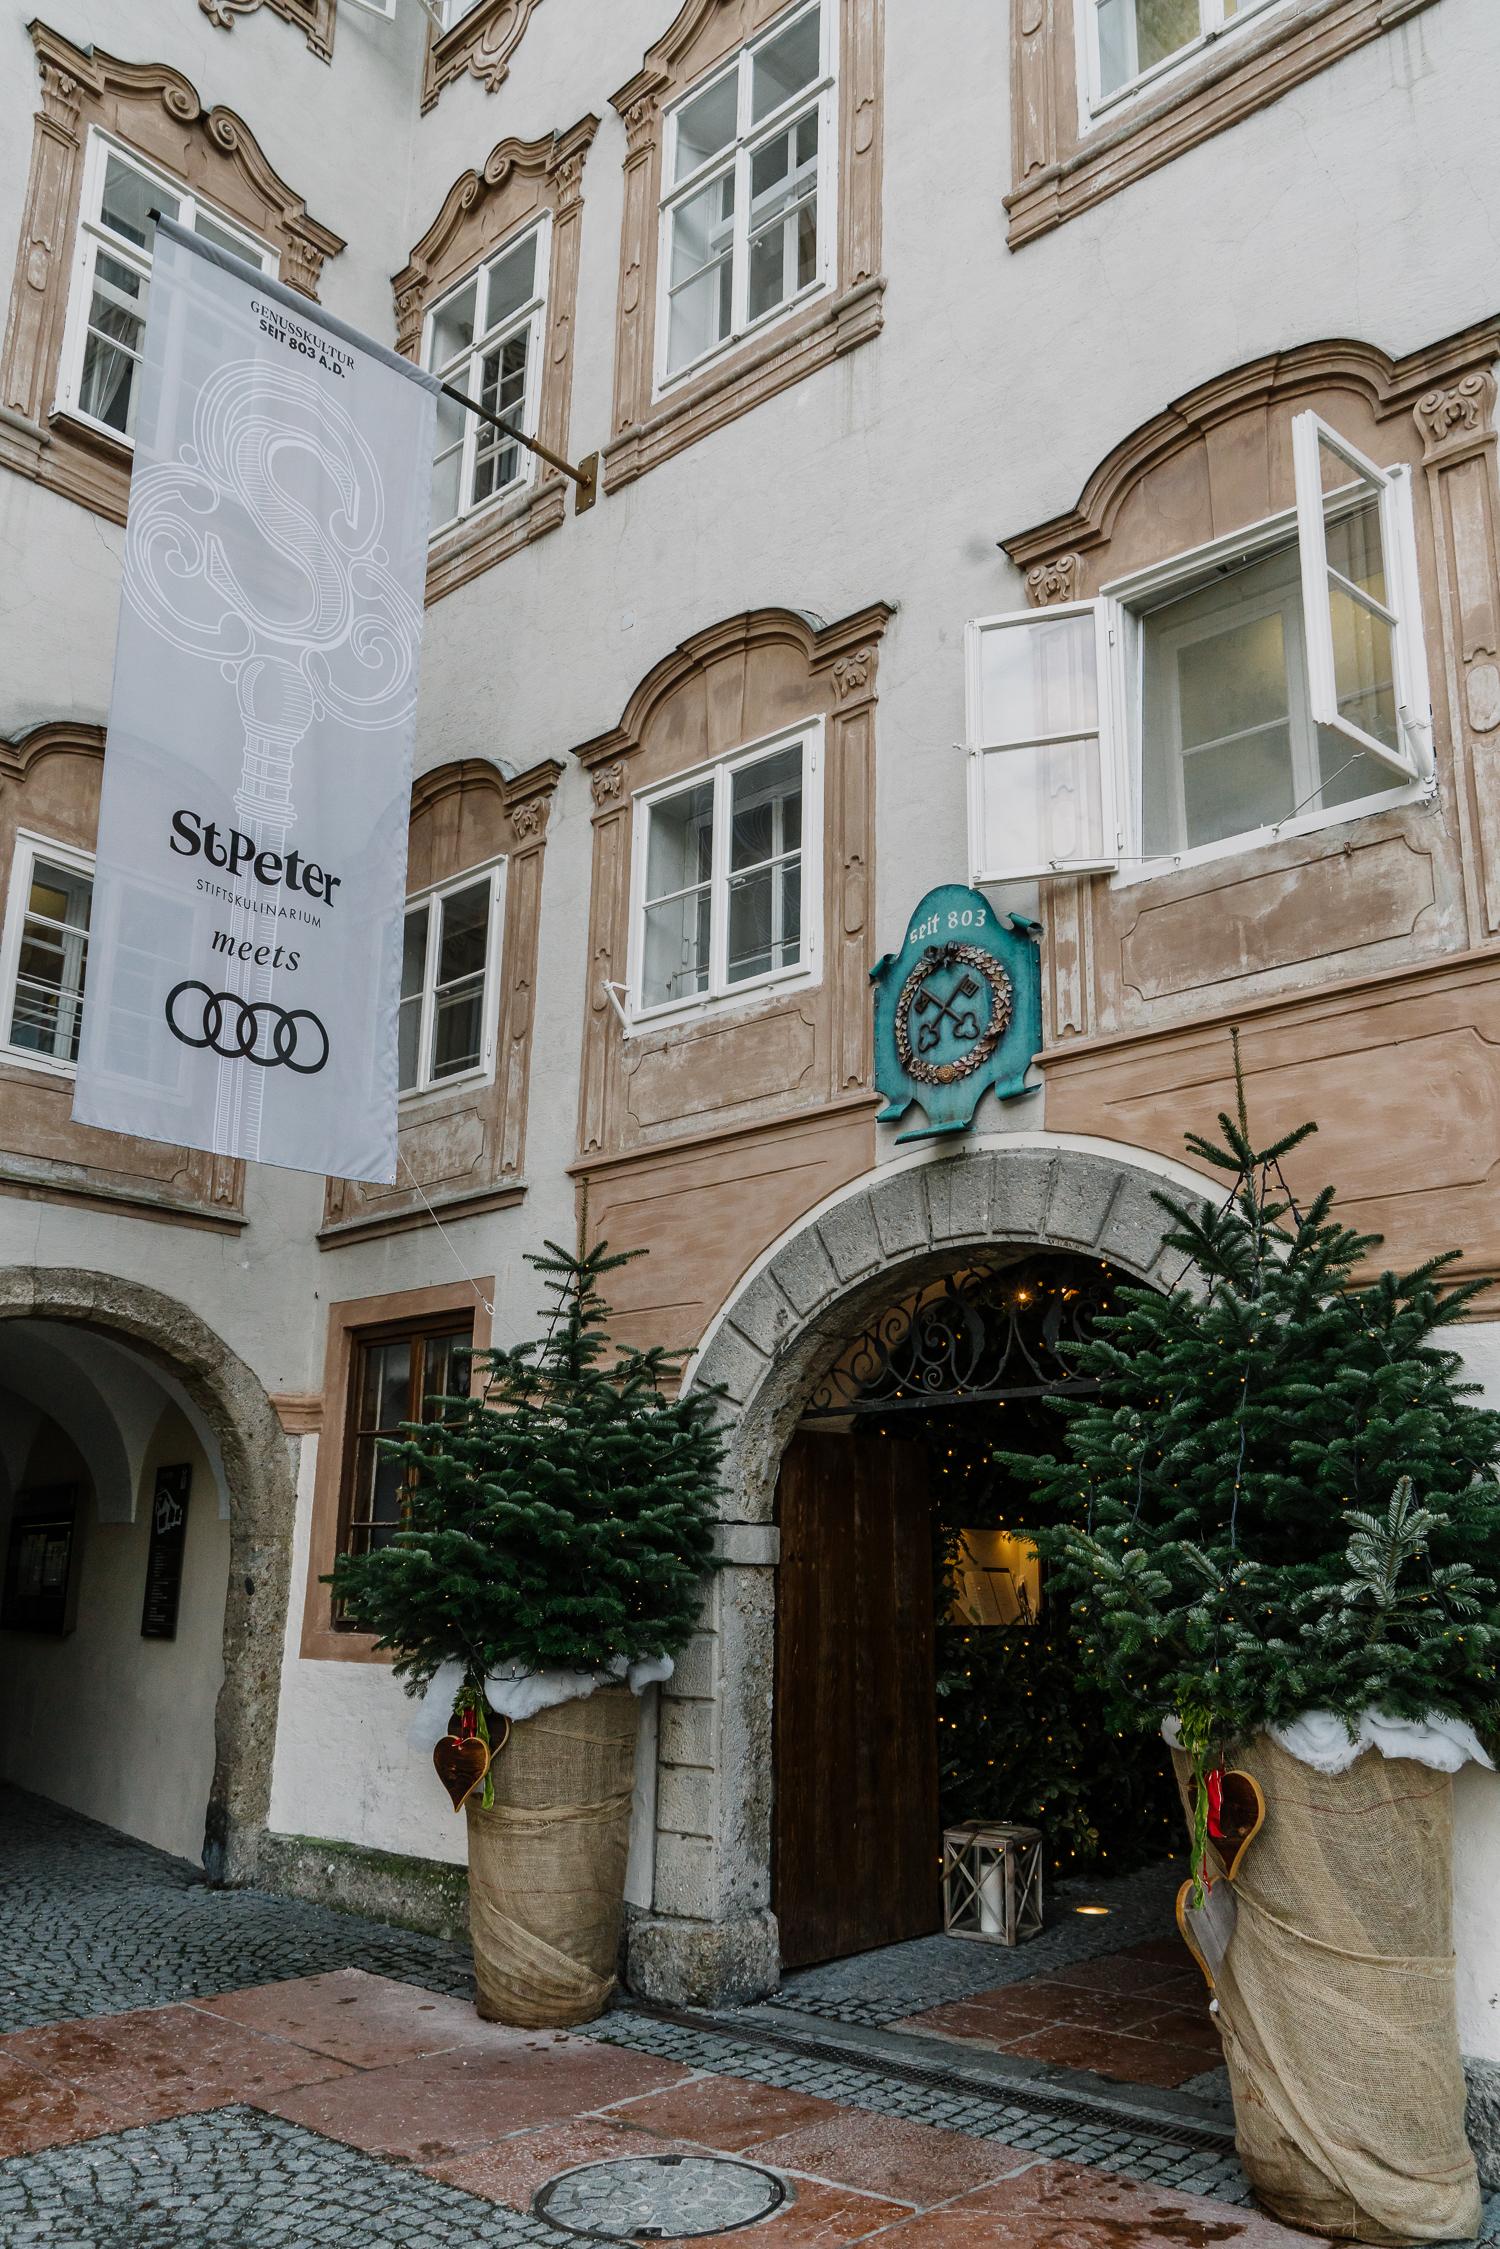 salzburg, austria, st. peters, where to eat in austria, salzburg travel diary